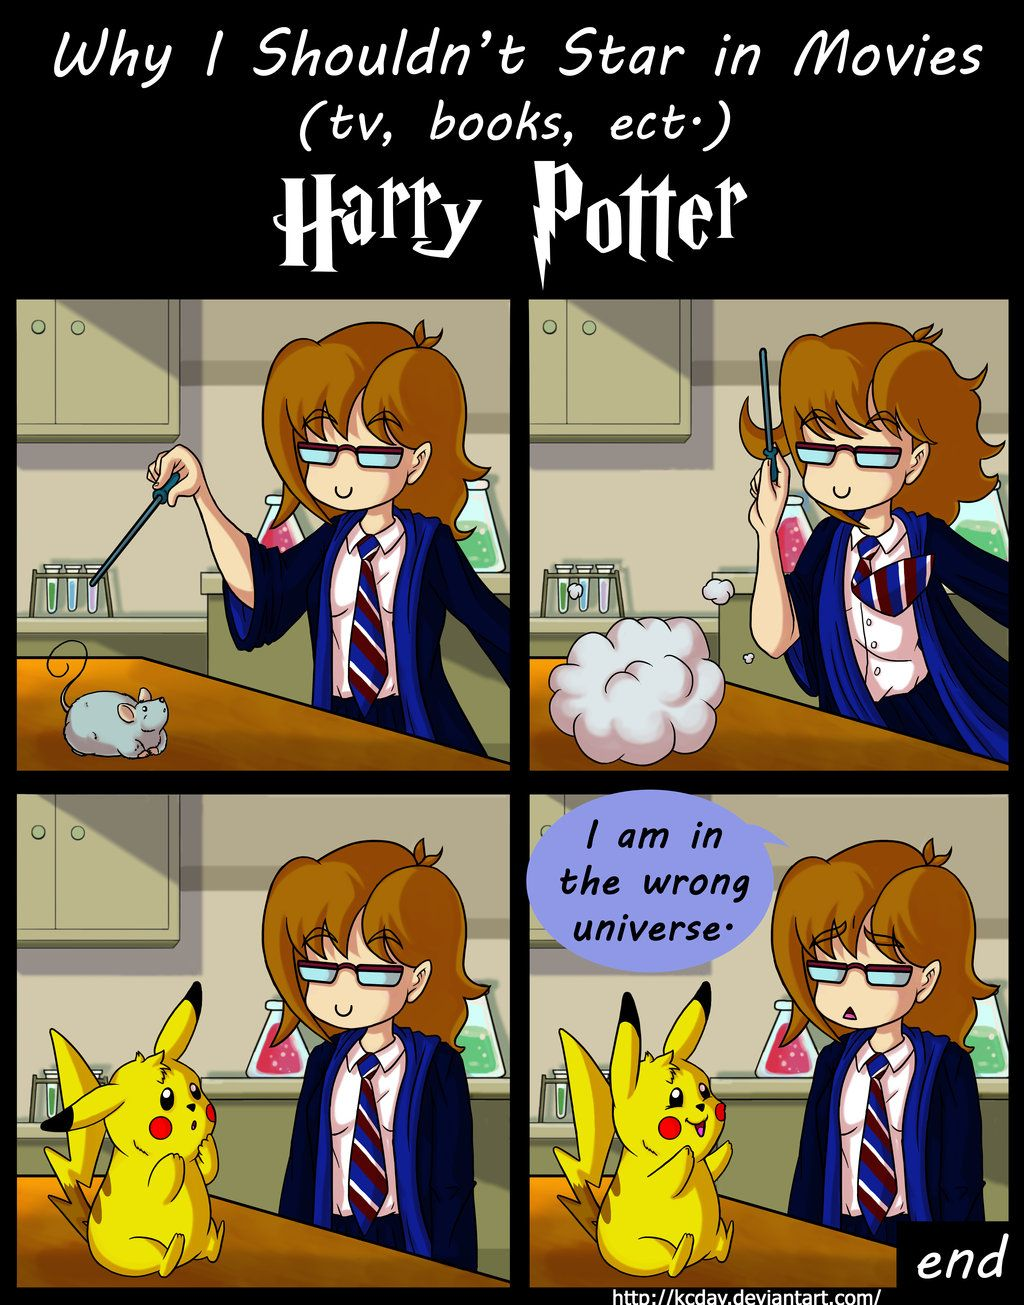 Harry Potter Posters Harry Potter Poster Harry Potter Films Harry Potter Movies